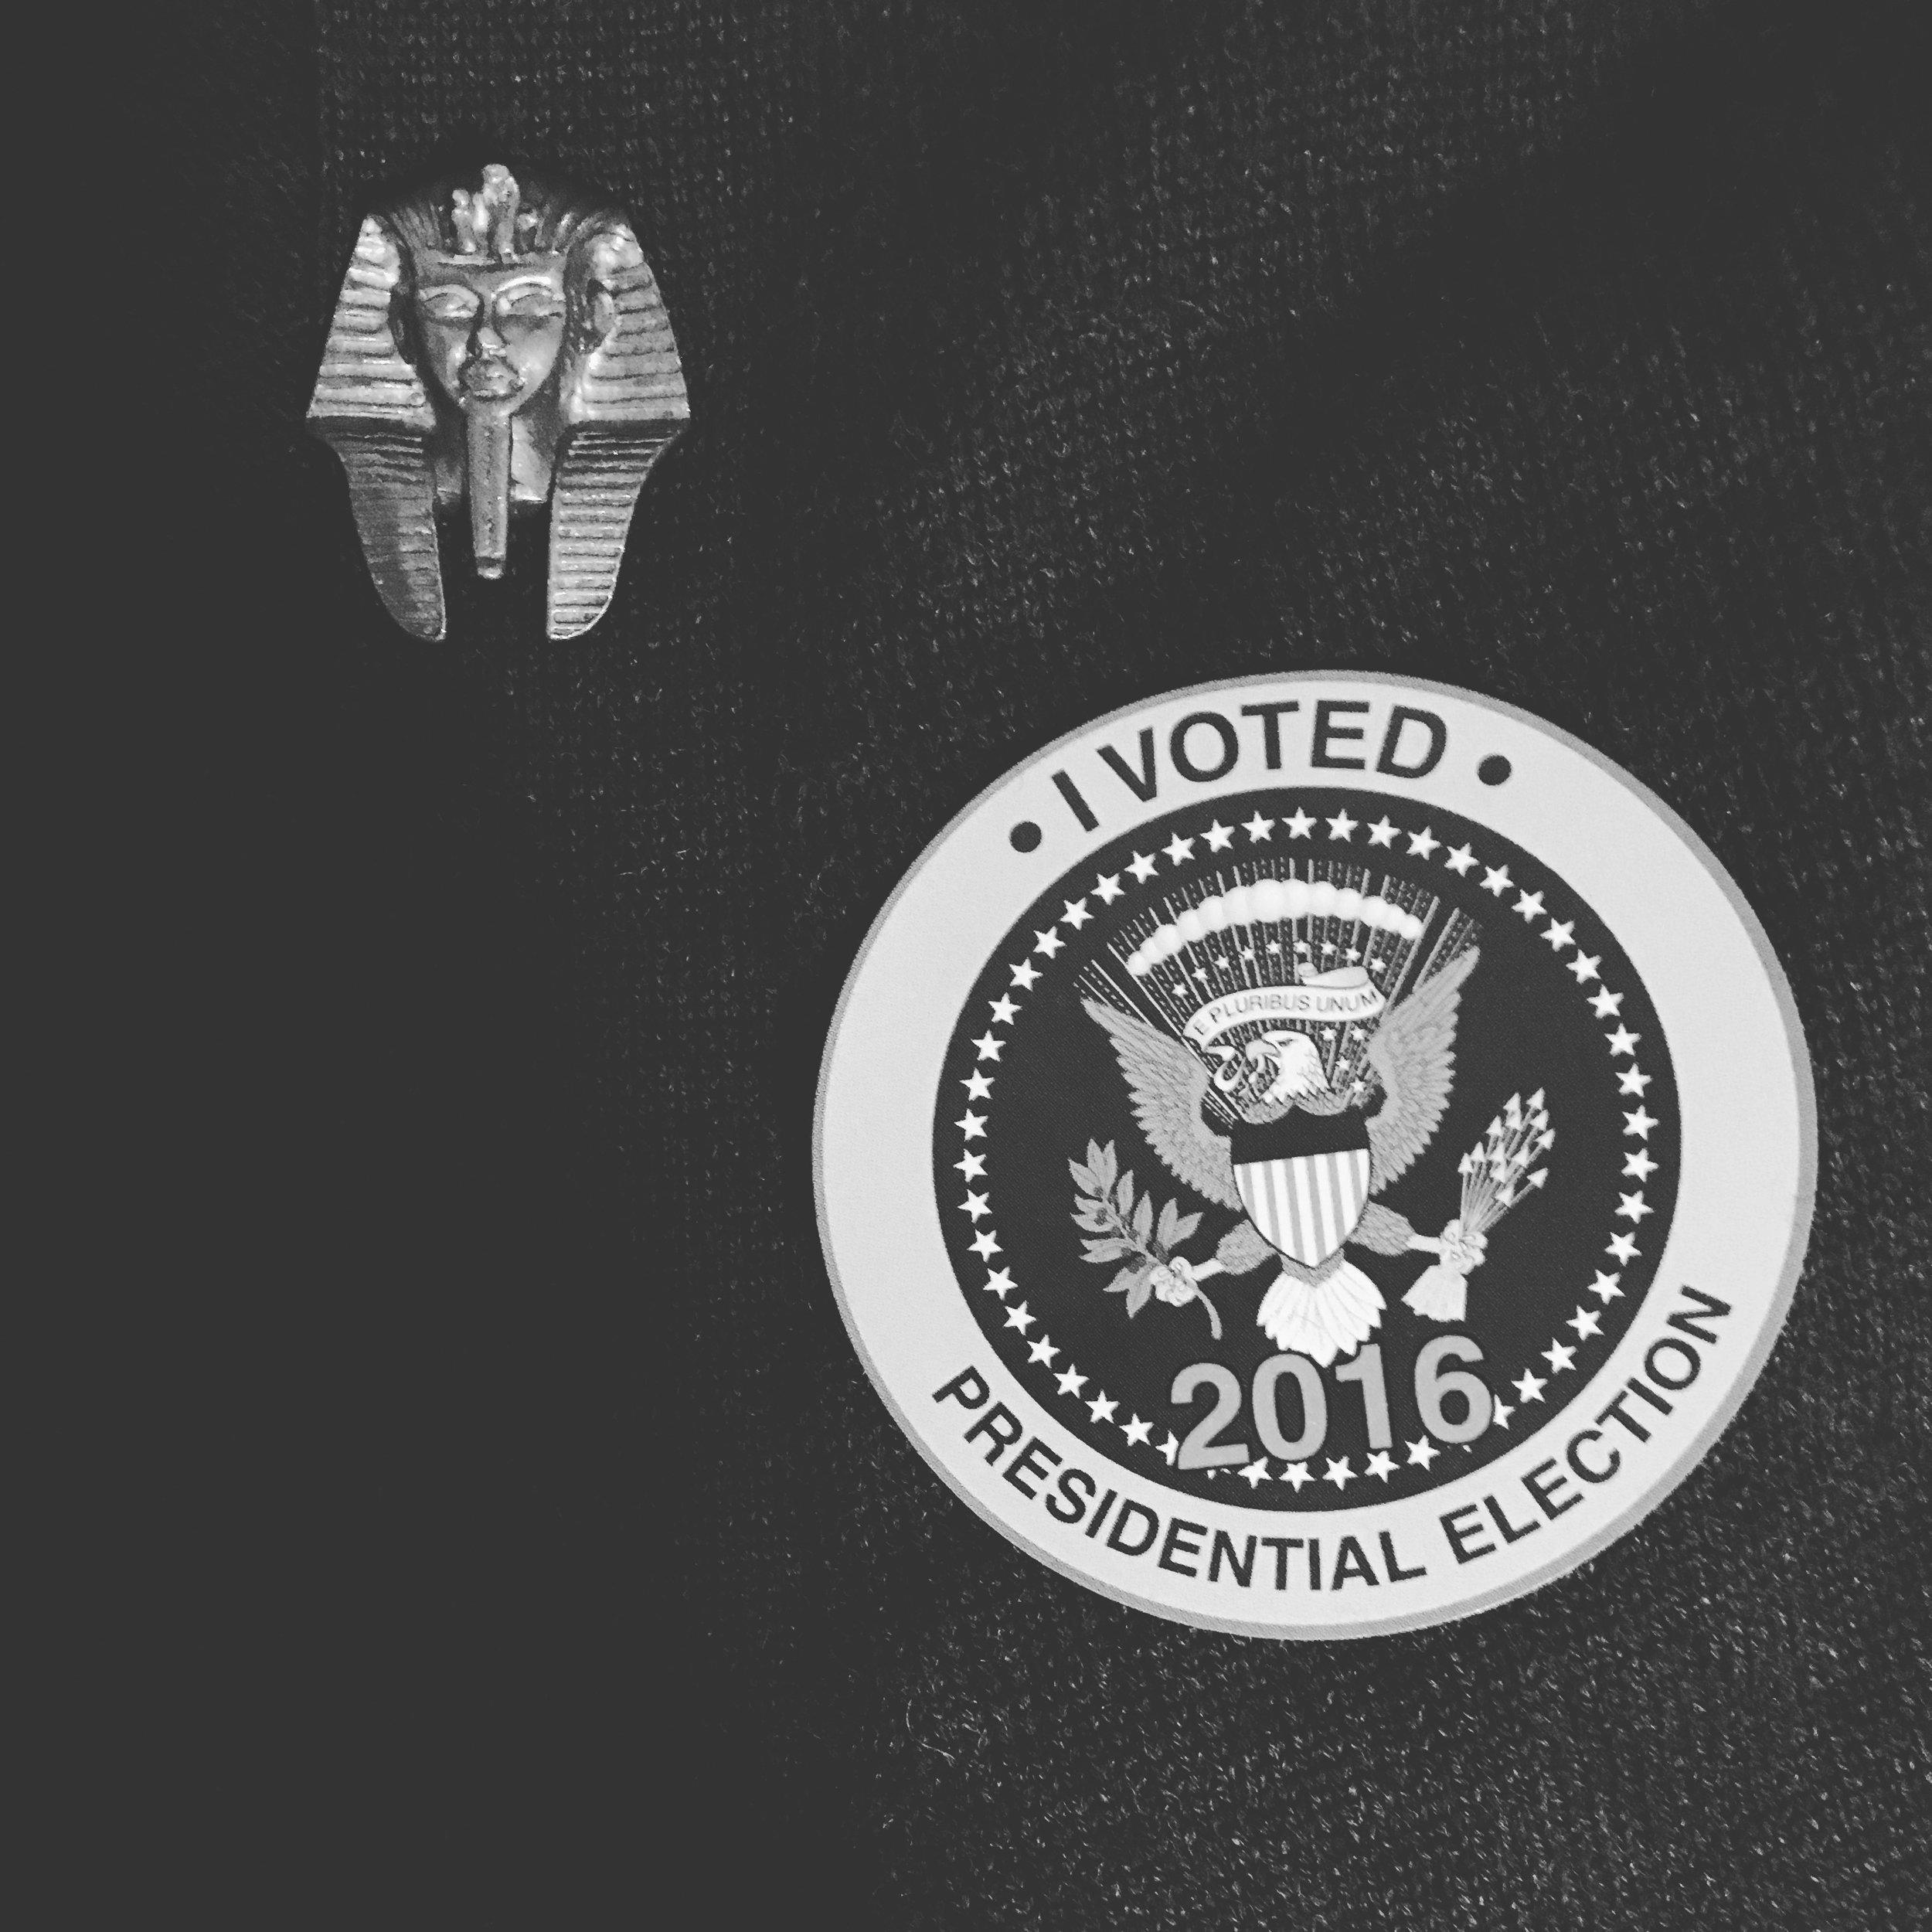 Alpha Phi Alpha, Zeta Lambda, A Voteless People Is A Hopeless People